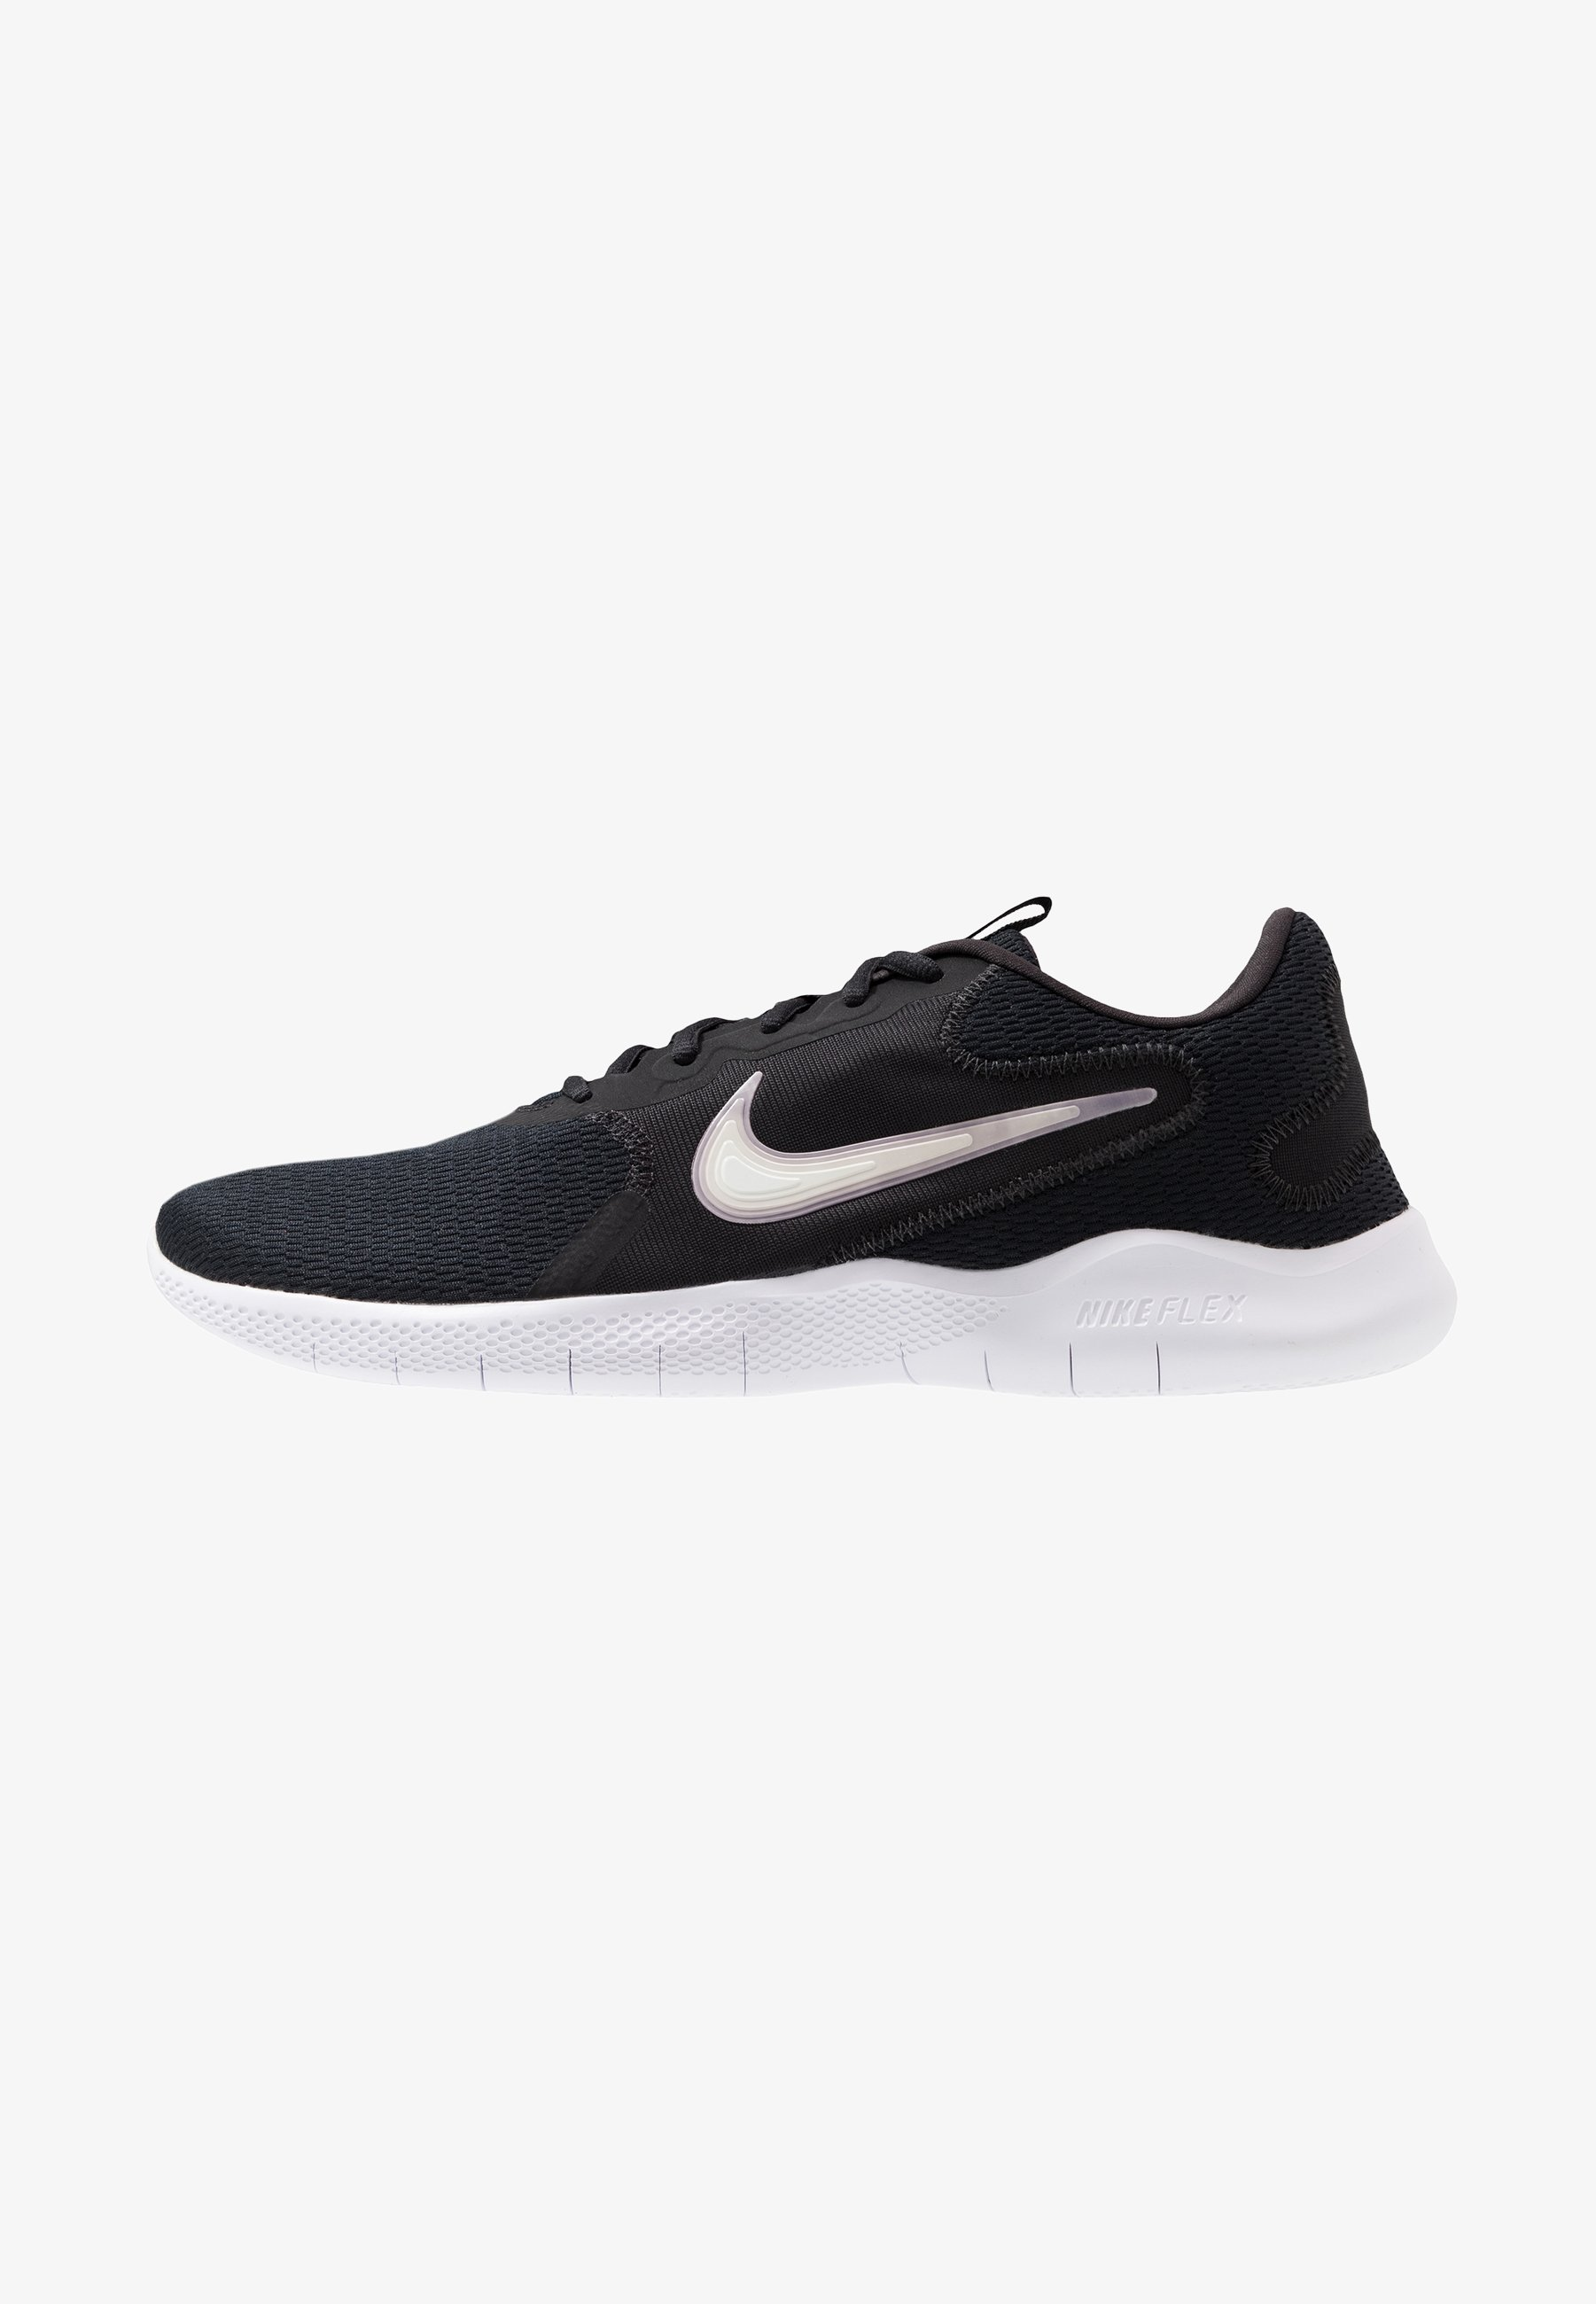 grava foso recurso  Nike Performance FLEX EXPERIENCE RUN 9 - Competition running shoes -  black/white/dark smoke grey/black - Zalando.co.uk